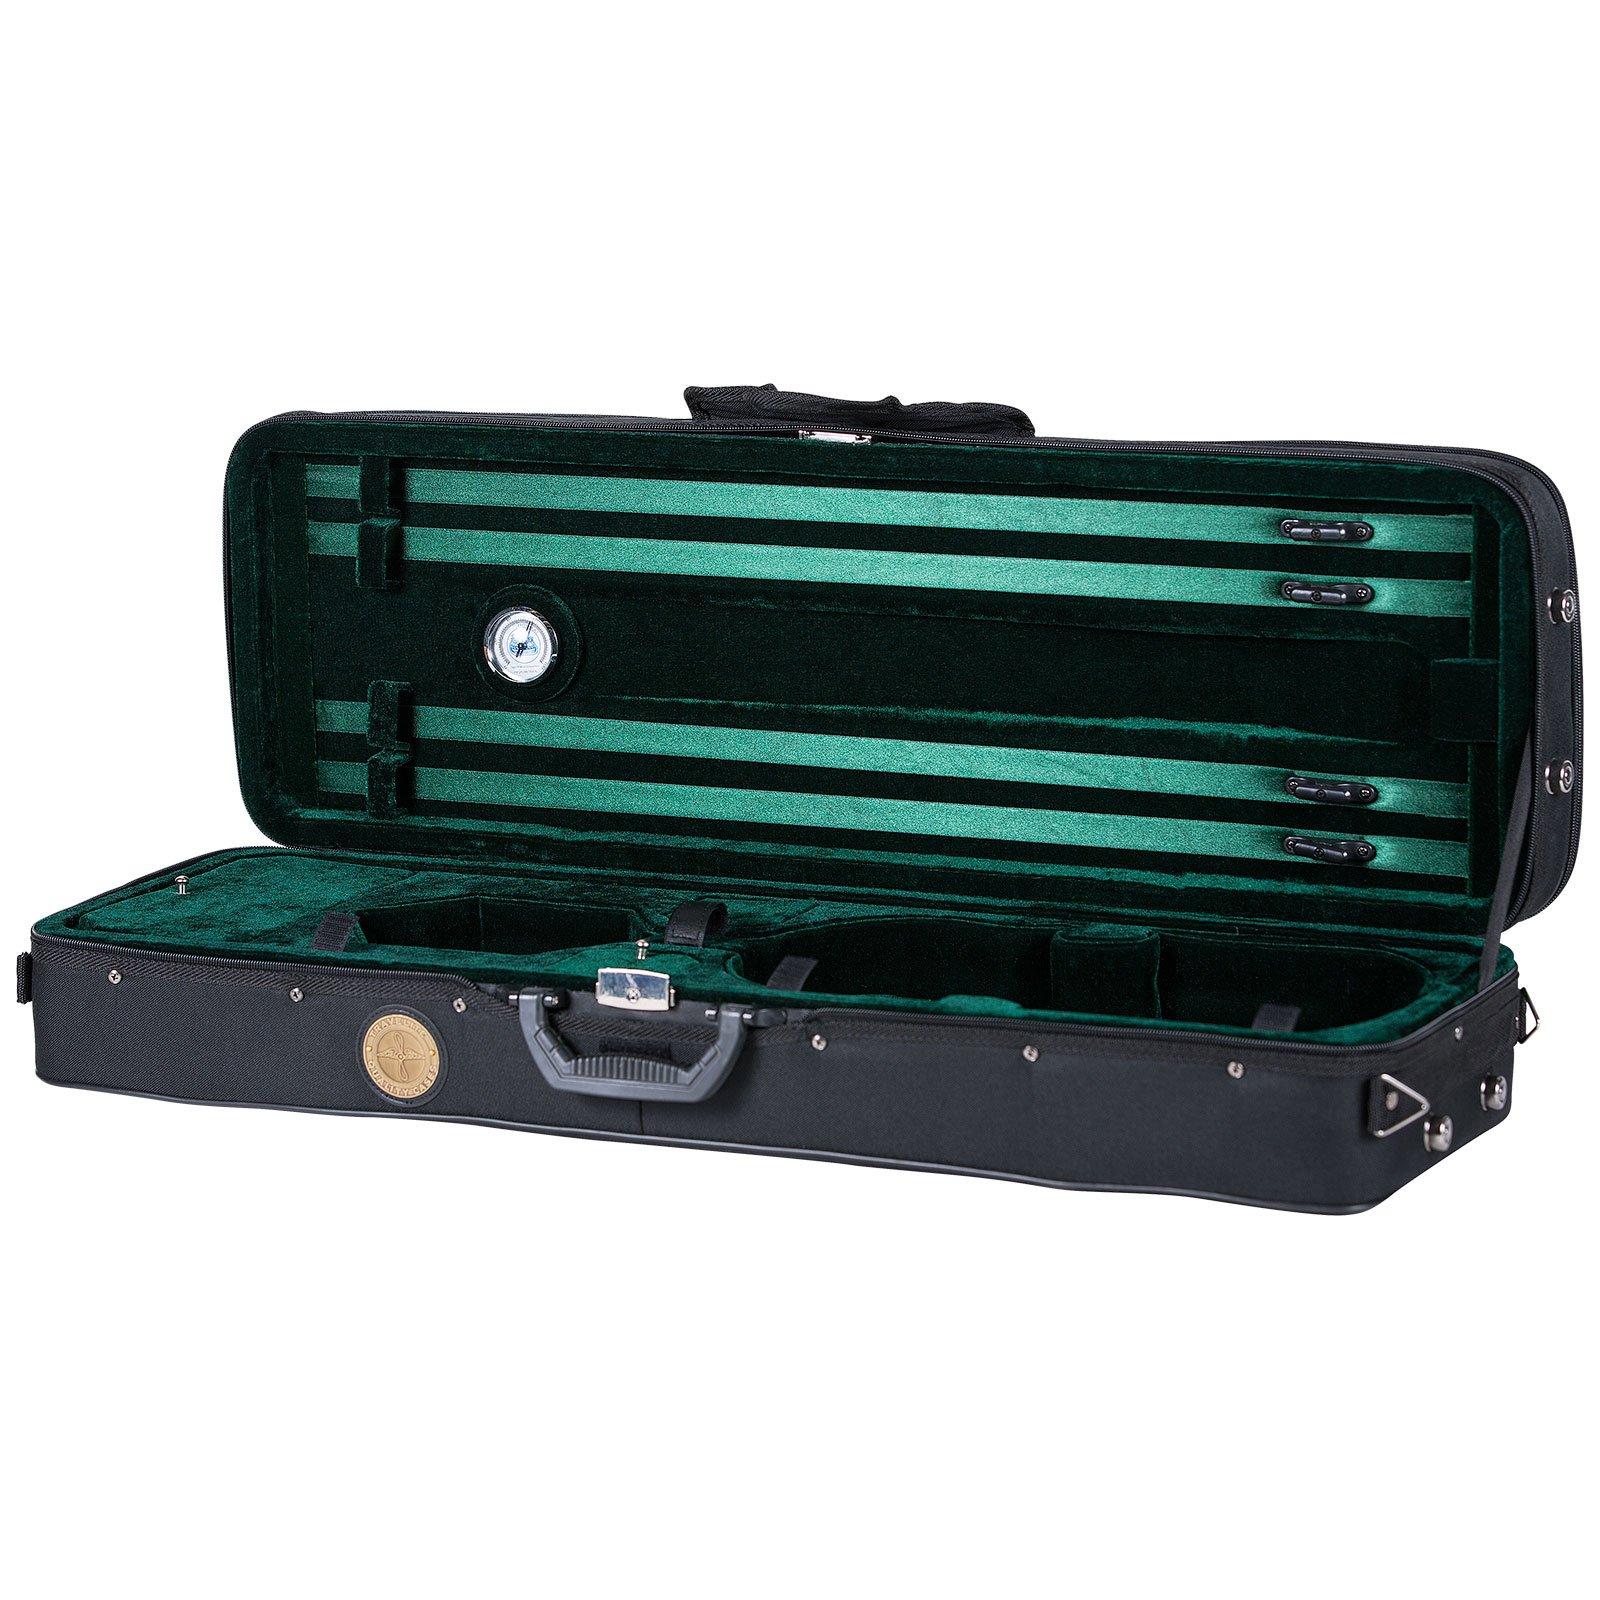 Travelite TL-35 Deluxe Violin Case - Oblong - 3/4 Size